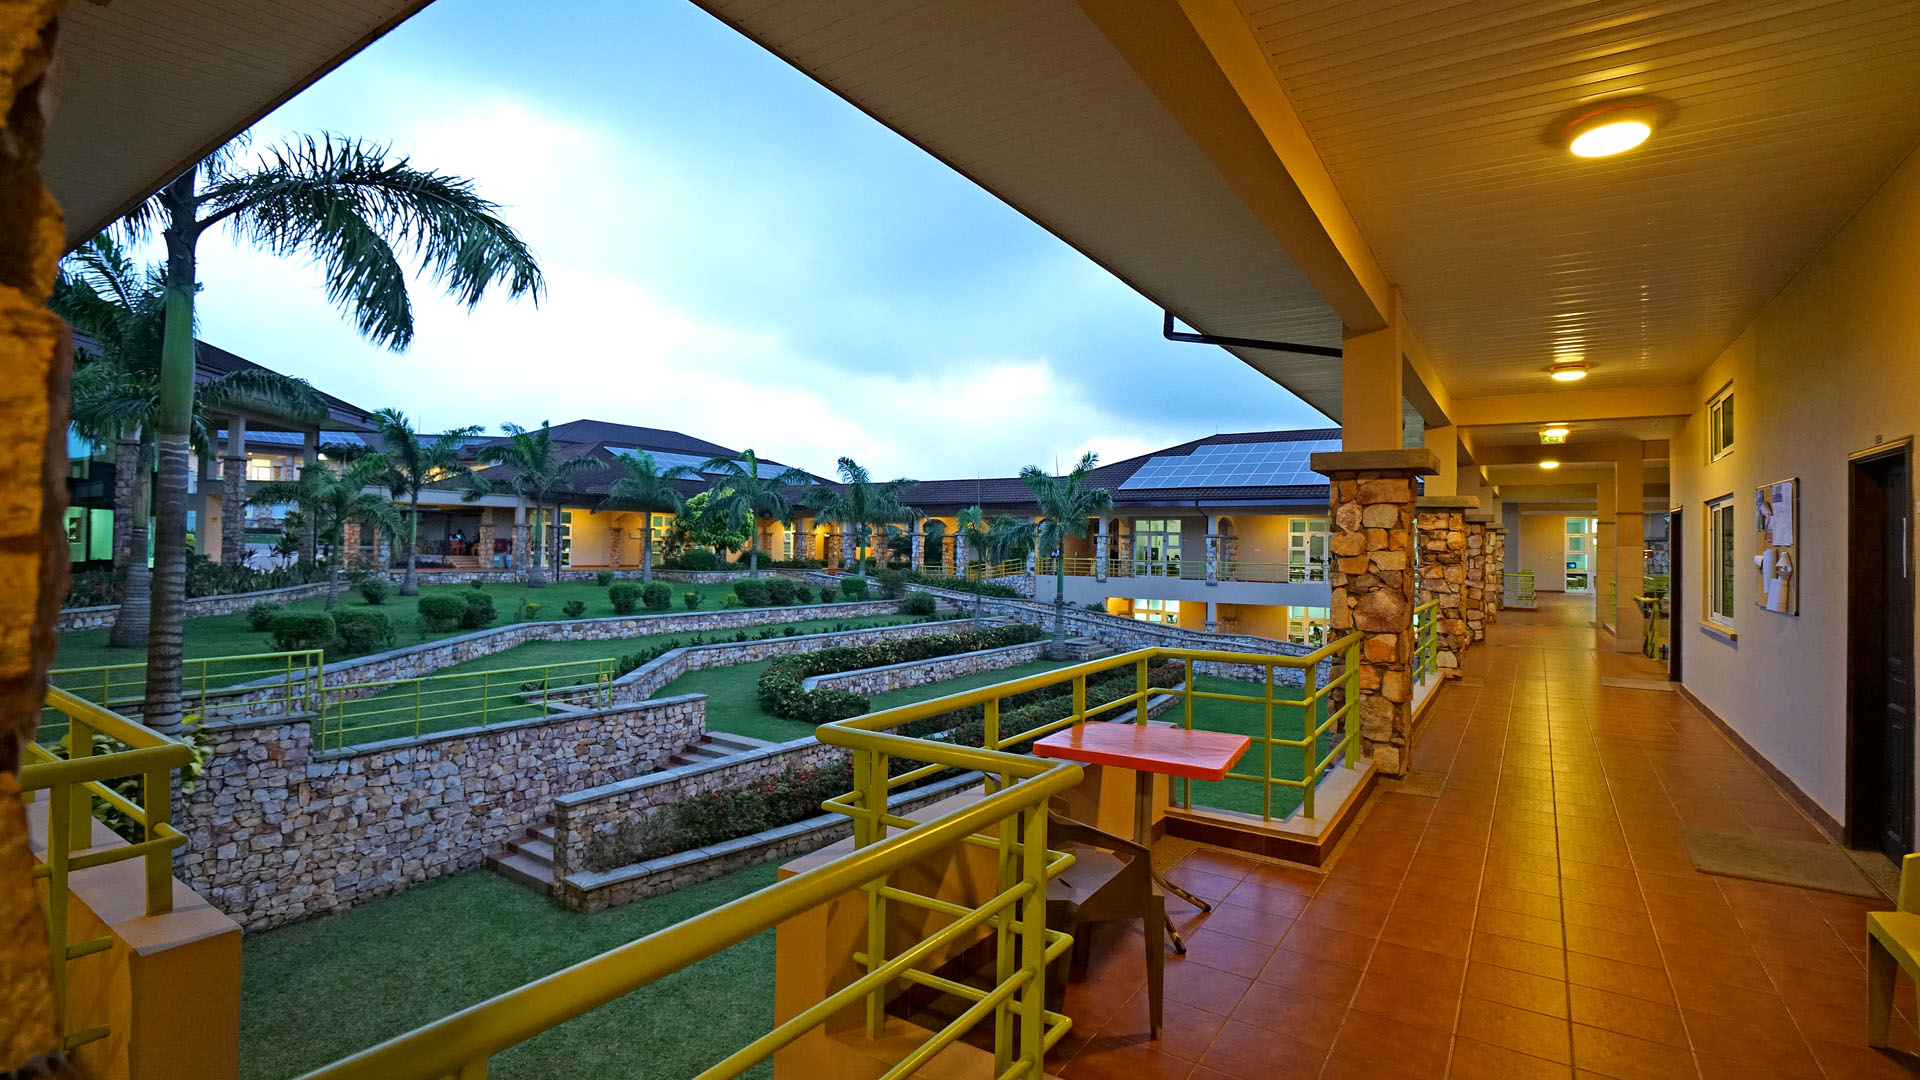 Welcome to Ashesi's Campus - Ashesi University